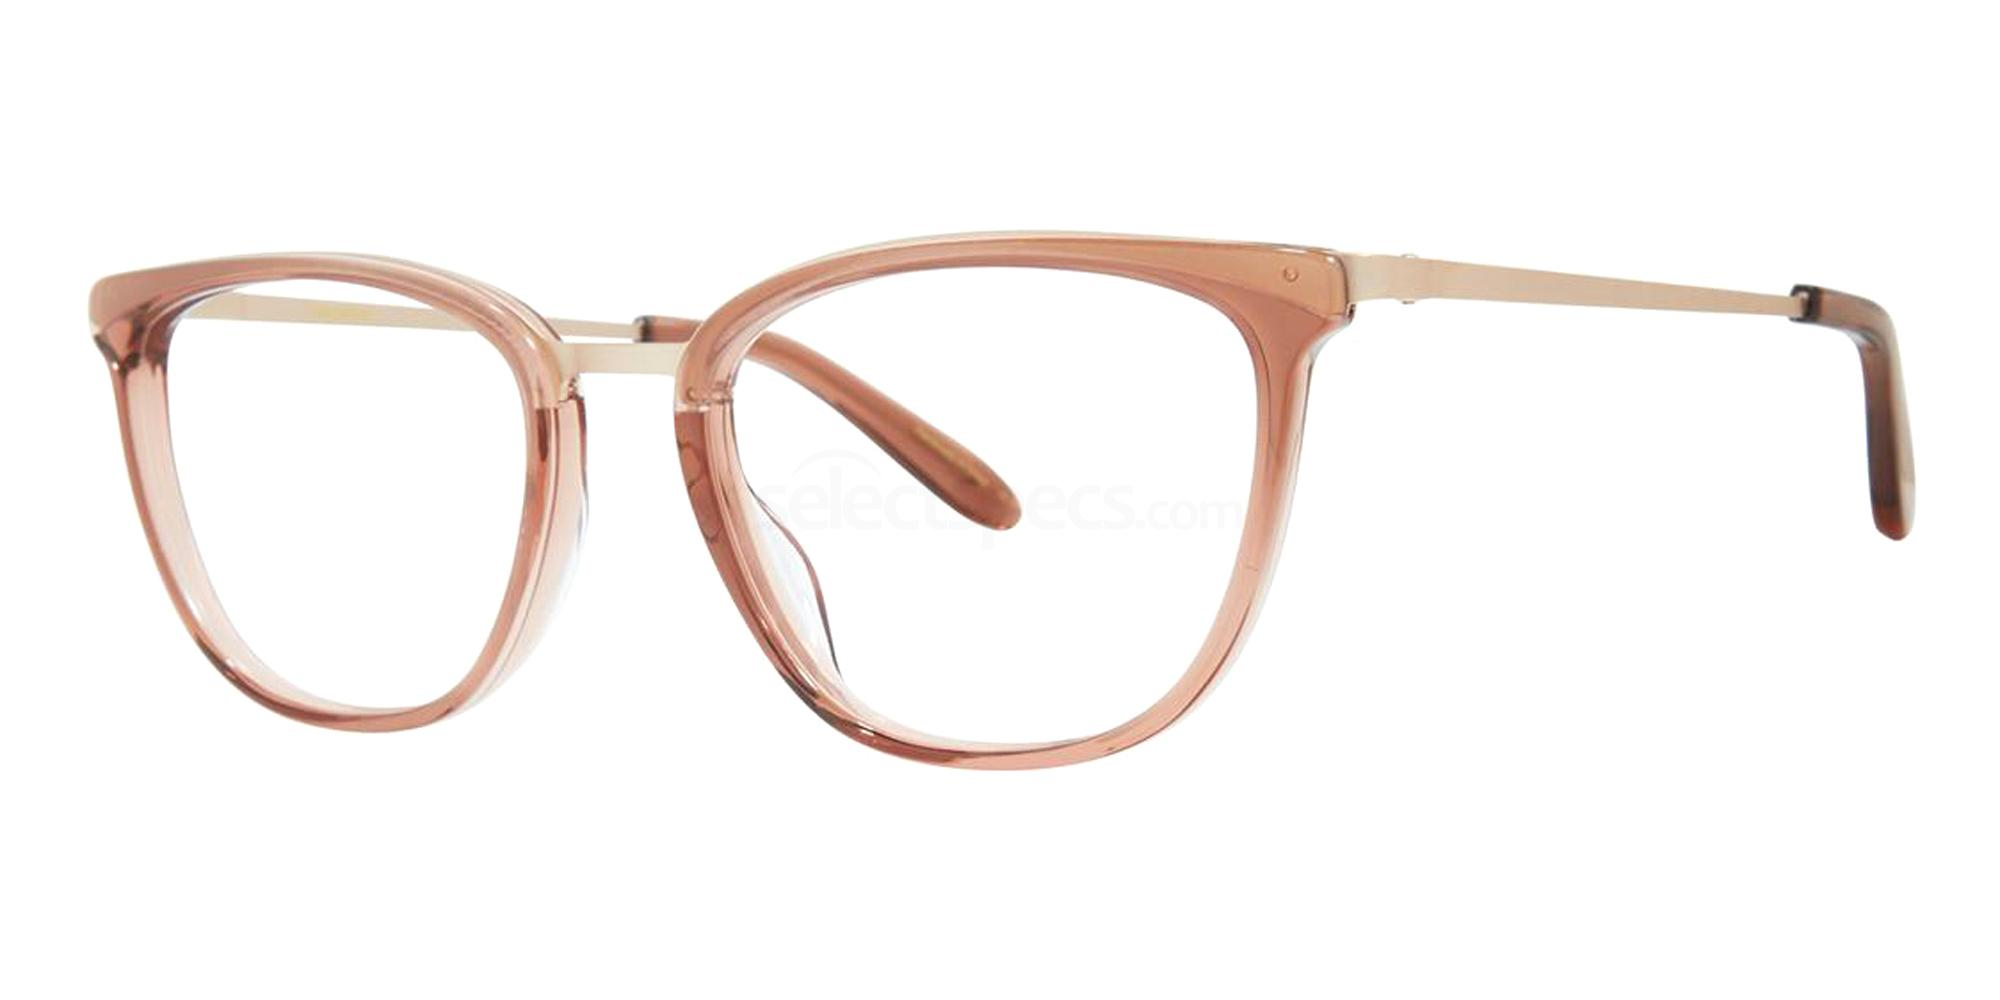 AW20 eyewear trends transparent glasses warm tones vera wang